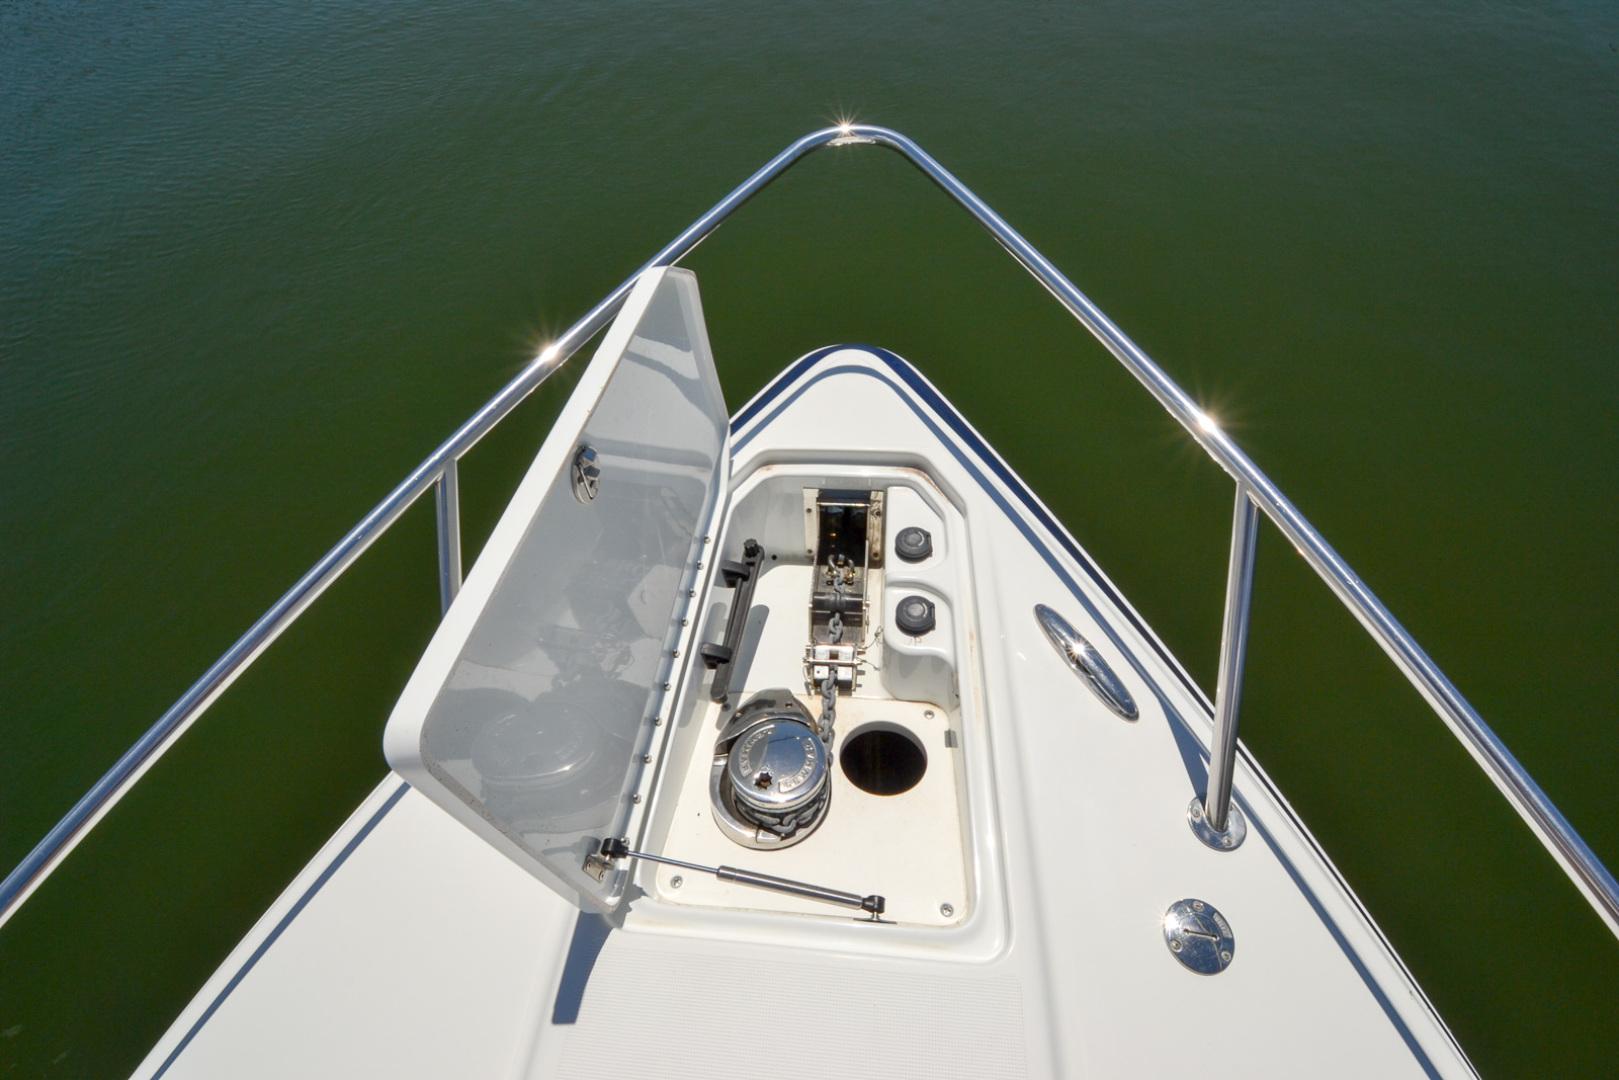 Anchor & Windlass